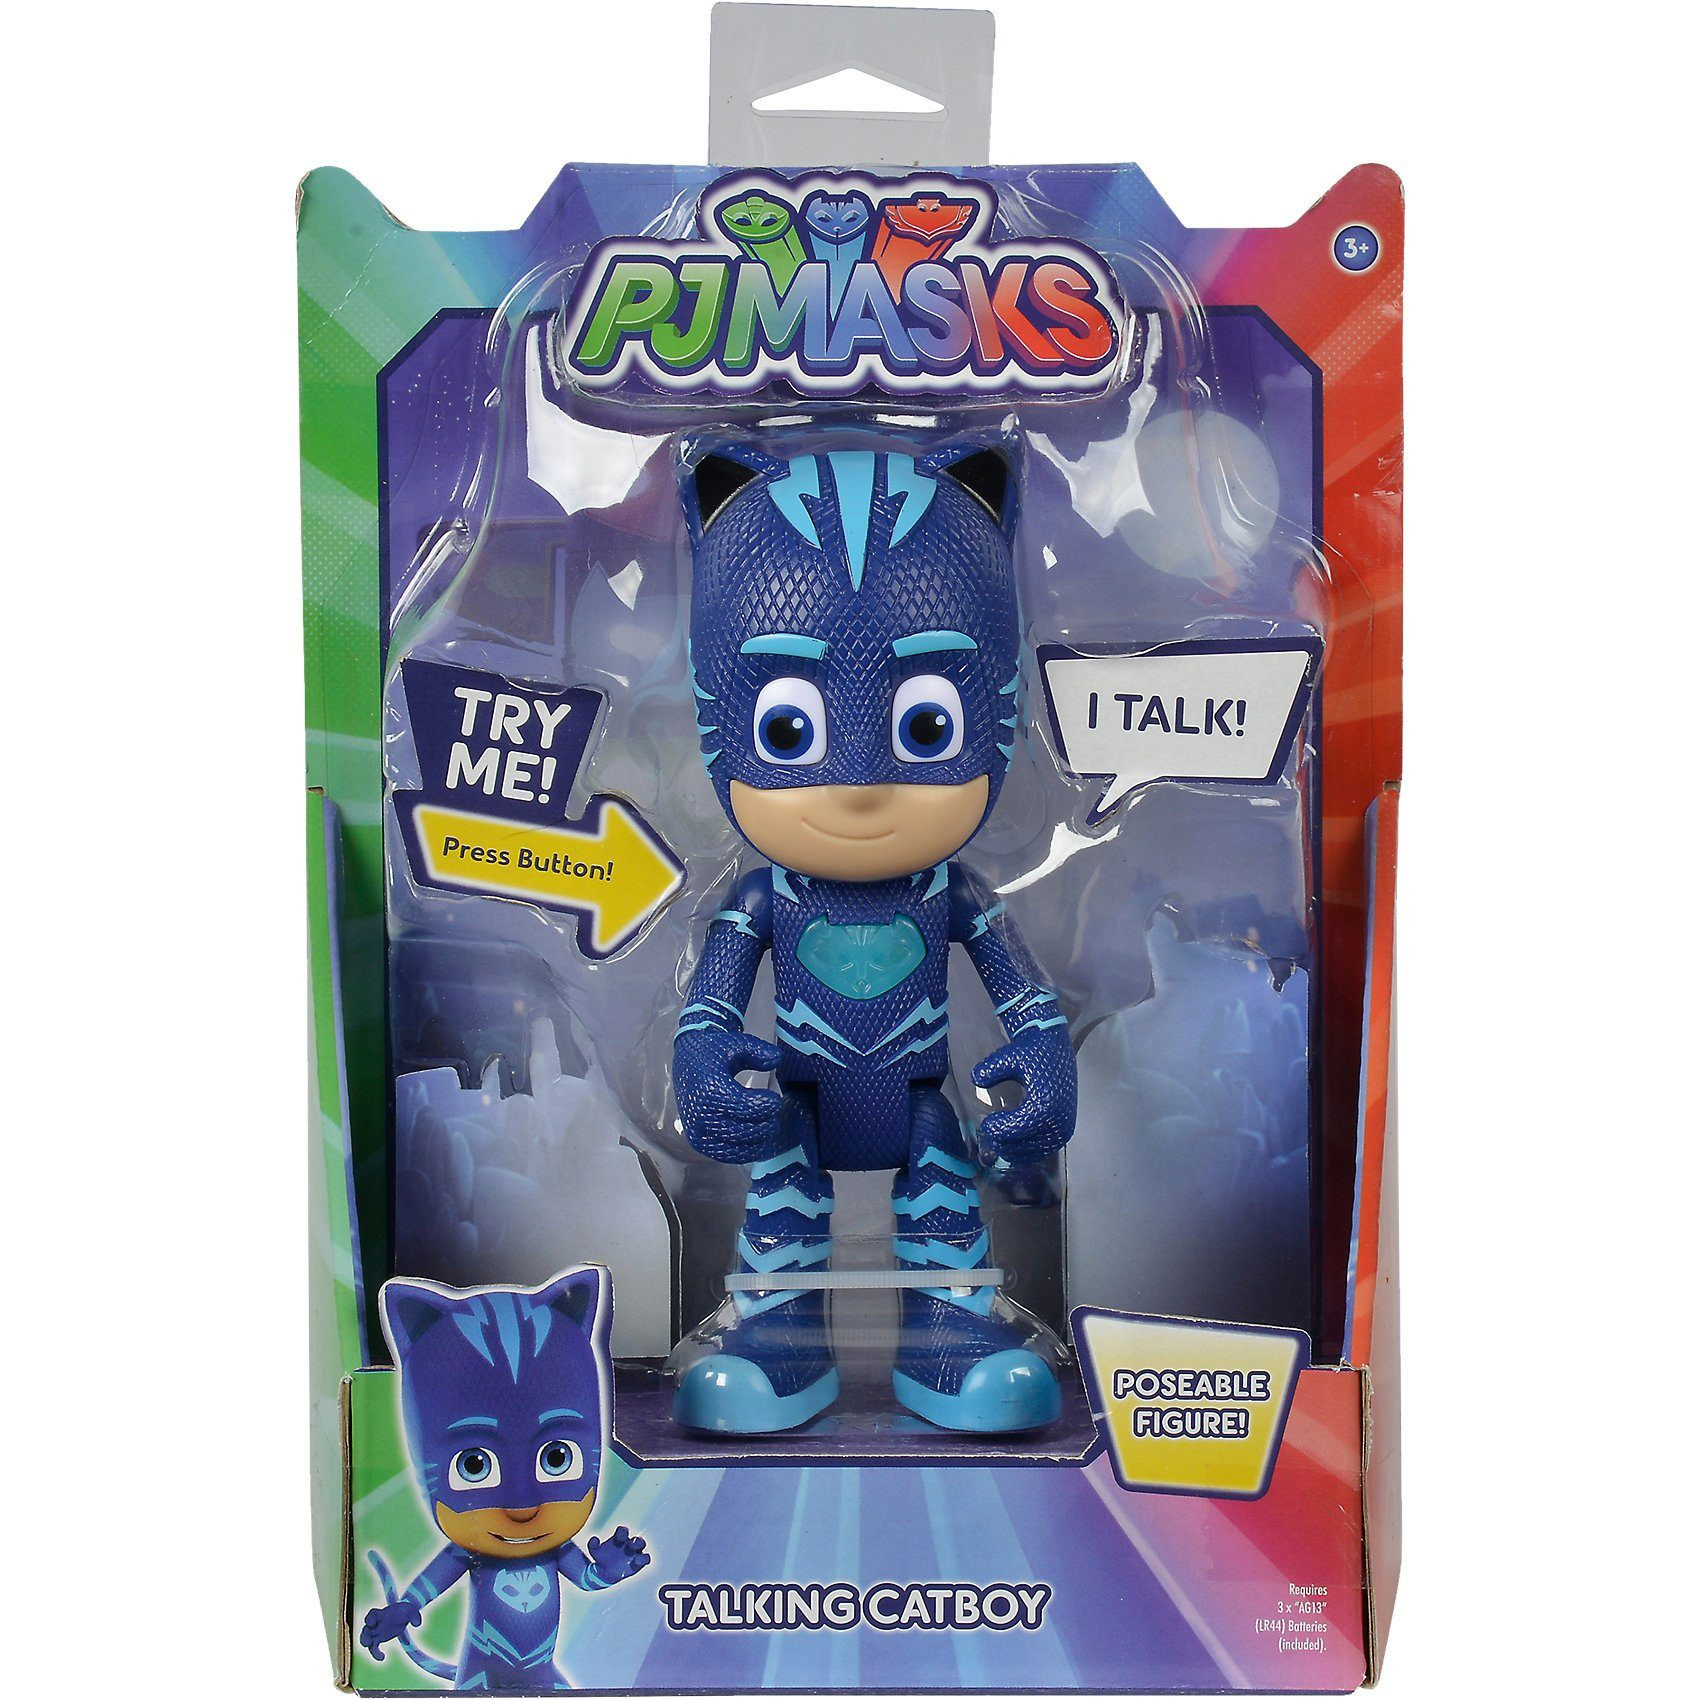 SIMBA PJ Masks Große Spielfigur Catboy